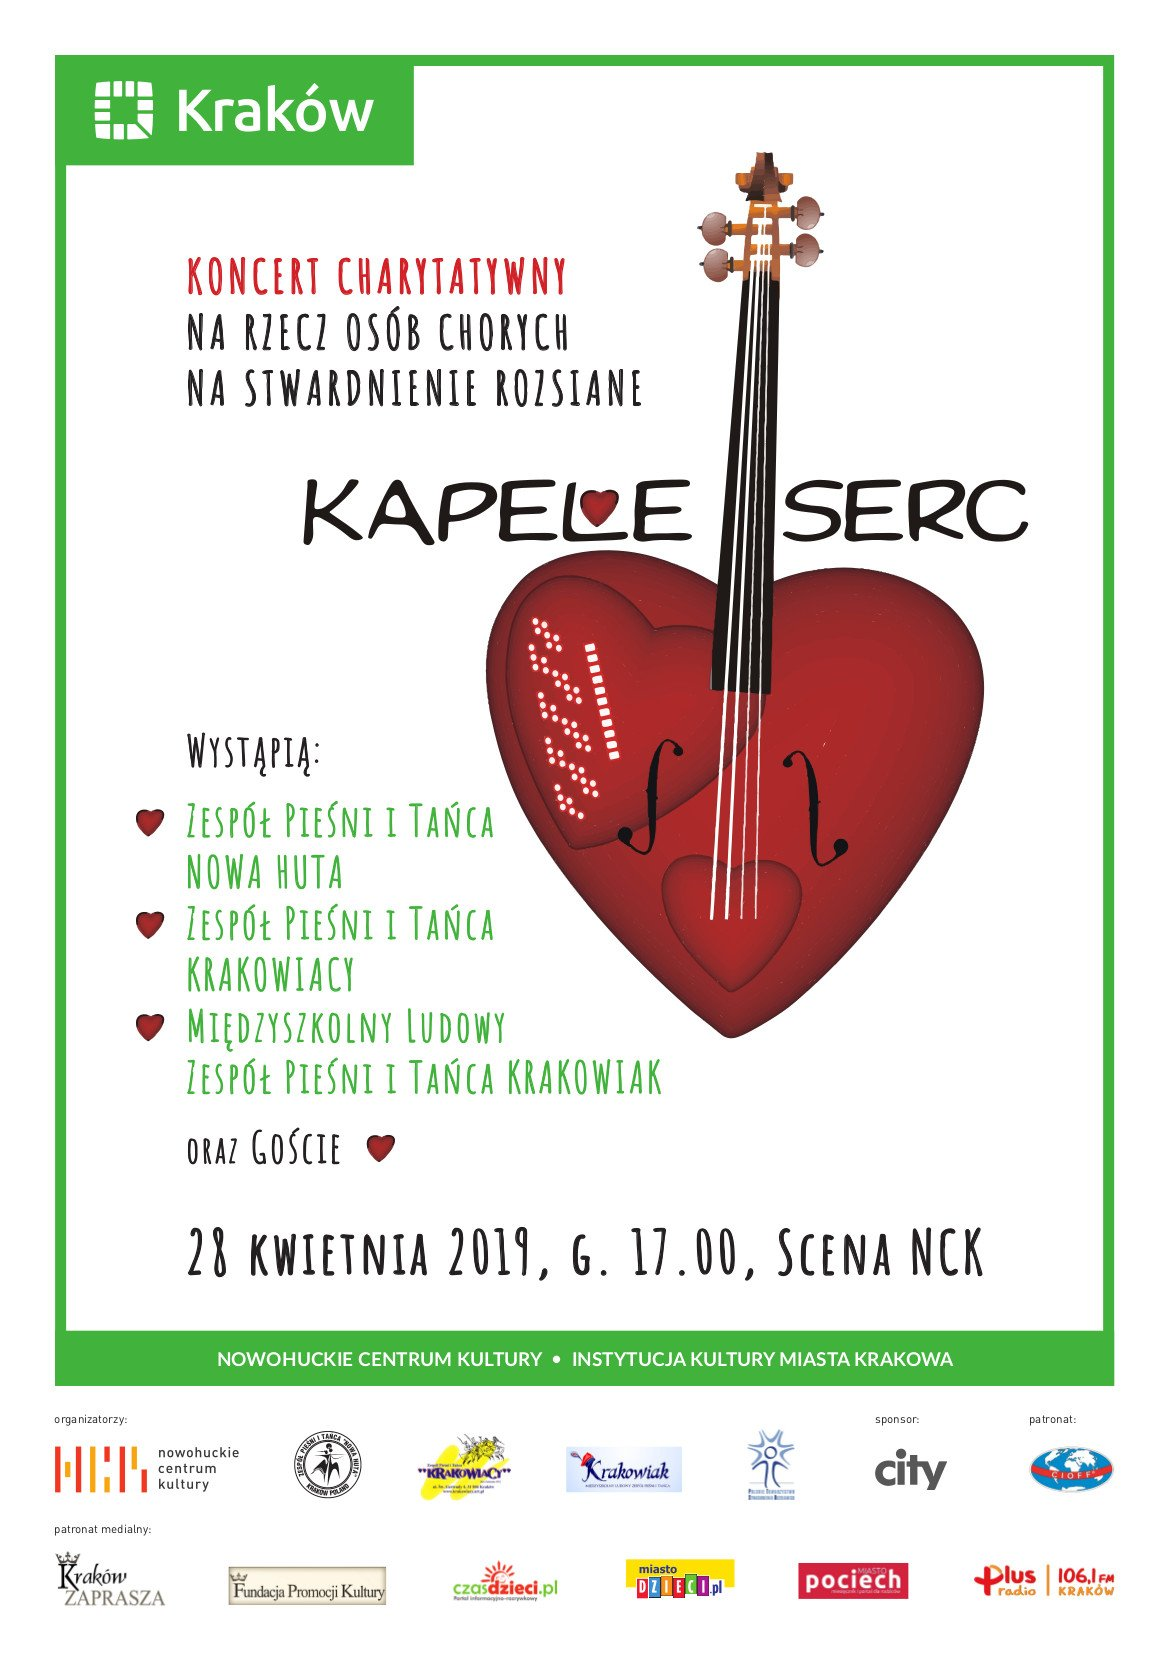 Koncert charytatywny Kapele Serc